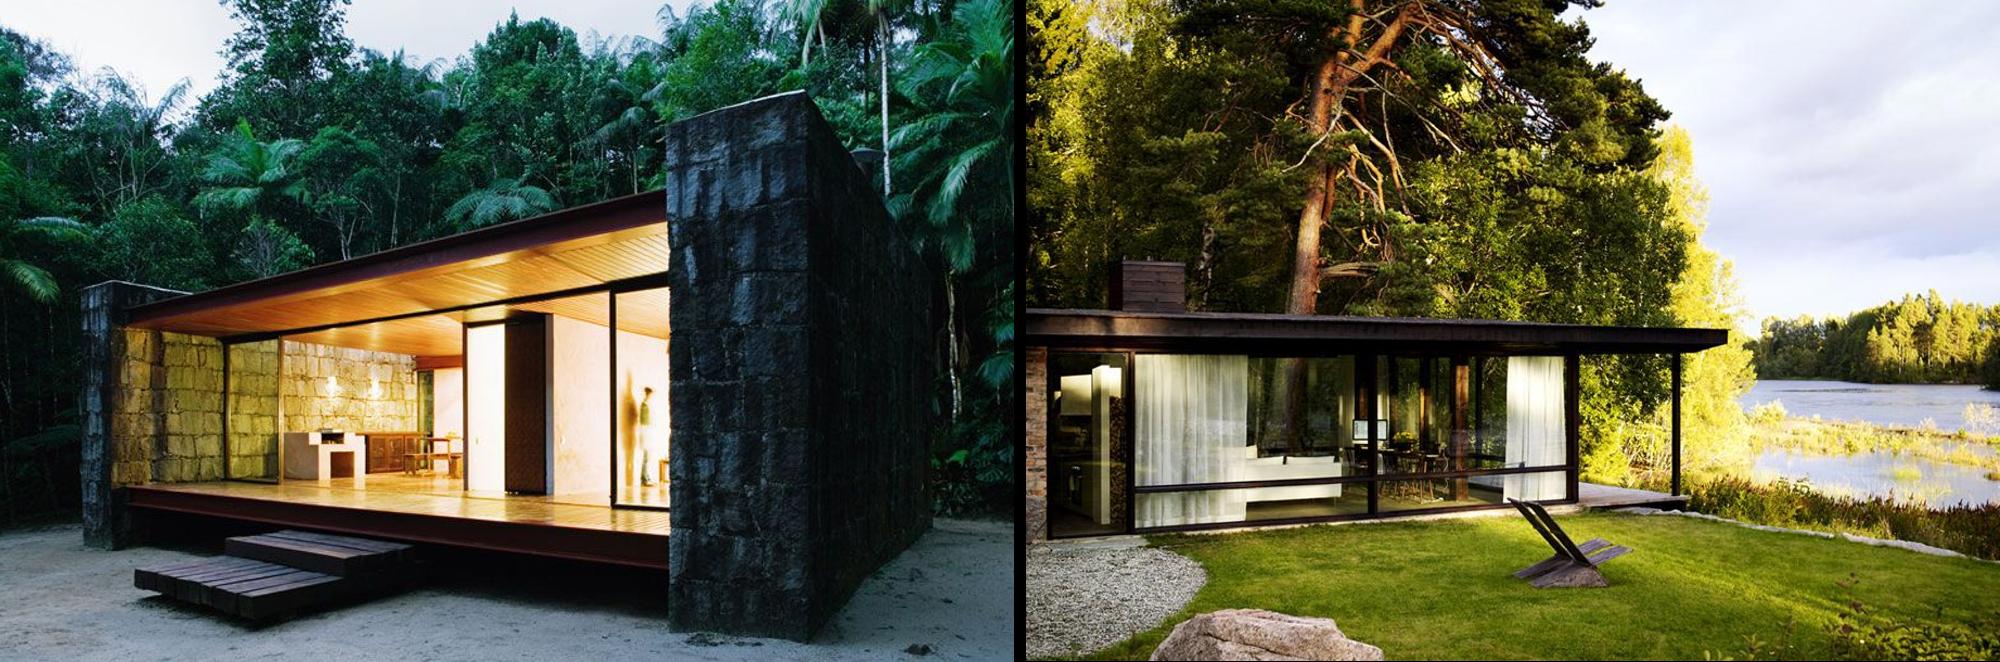 Dise os de casas de campo peque as planos de arquitectura for Planos de casas de campo rusticas